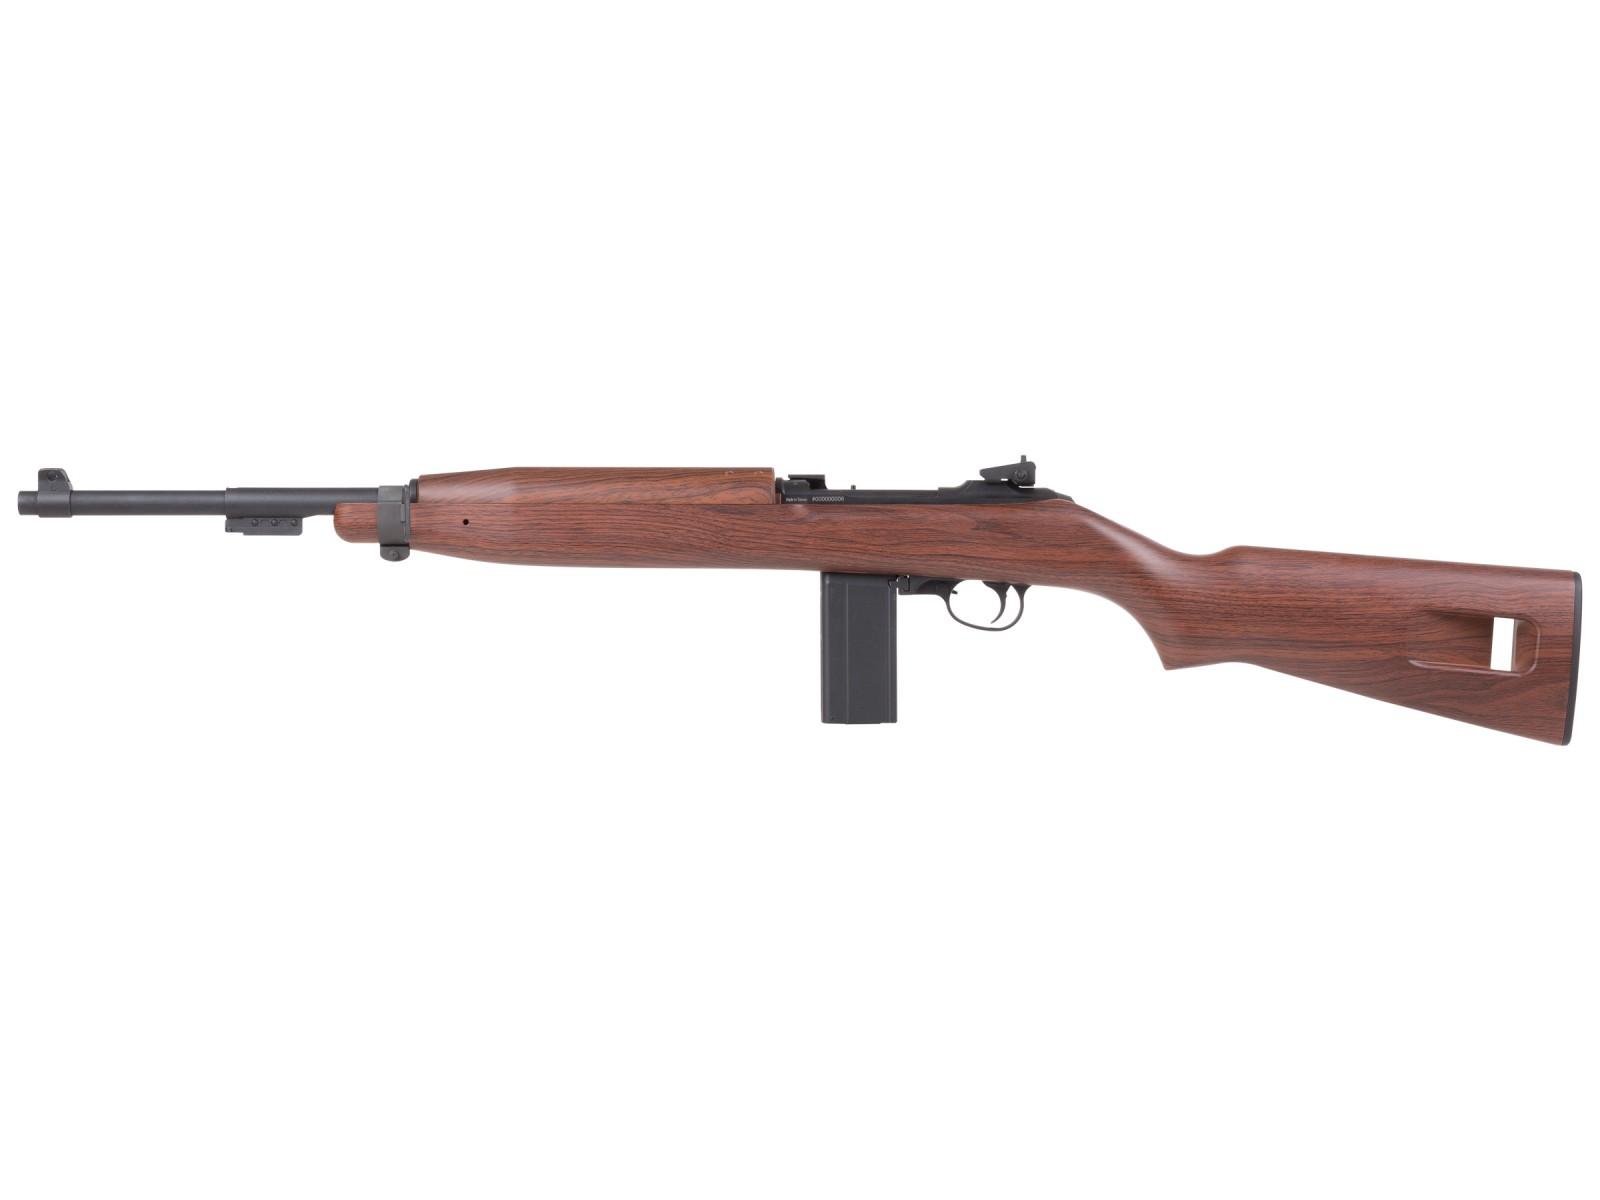 Springfield Armory M1 Carbine BB Rifle, Wood Stock